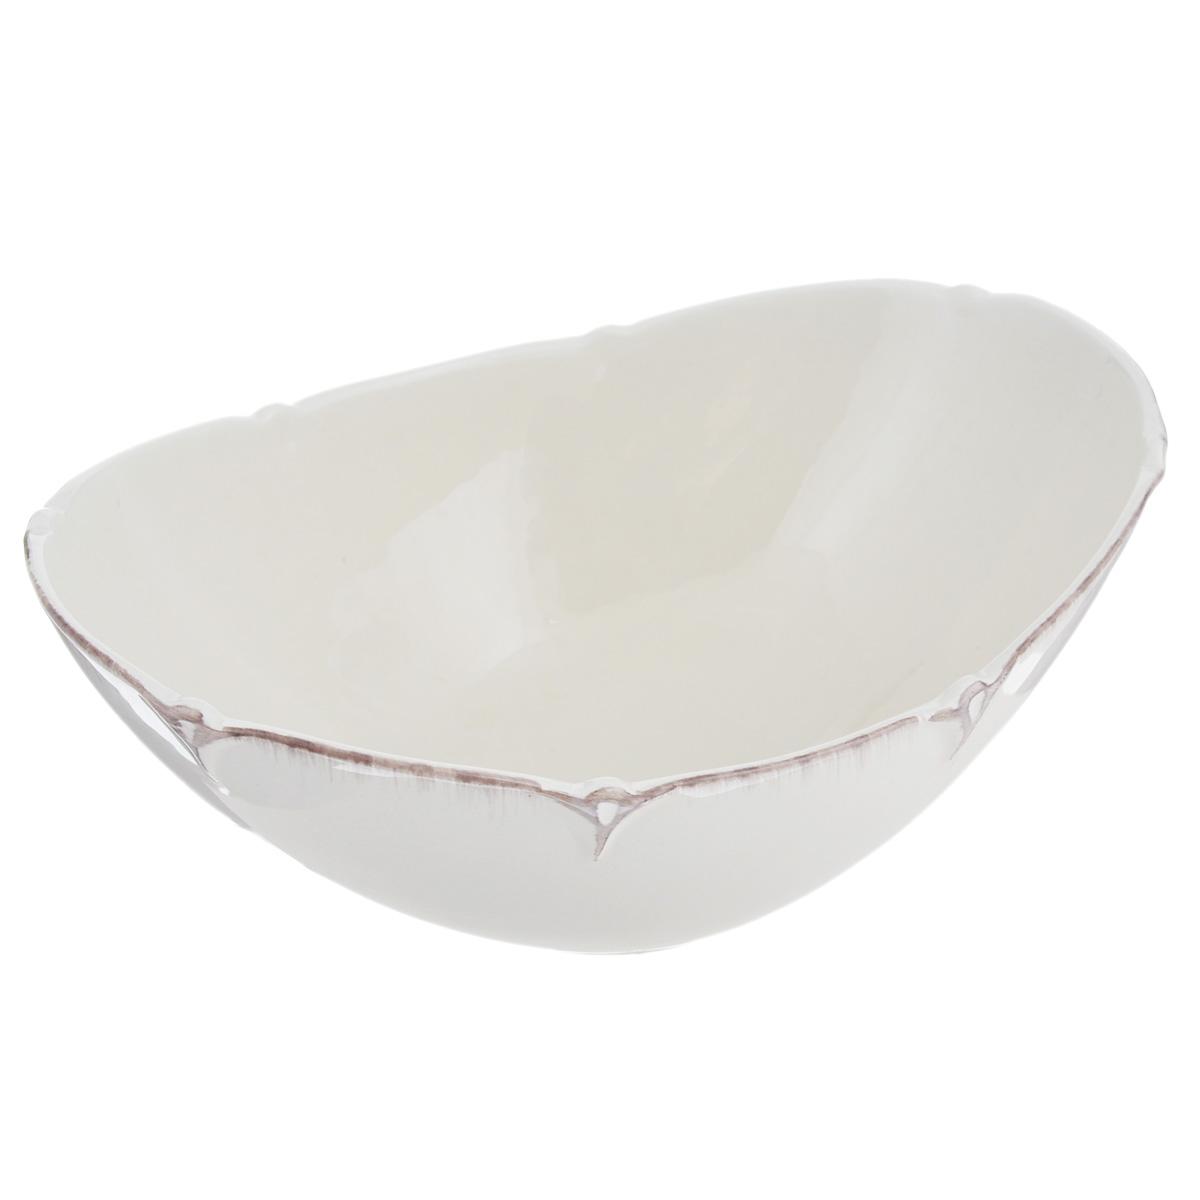 "Лилло / Lillo Салатник Lillo ""Ideal"", цвет: молочный, 22 см х 16 см 214949"